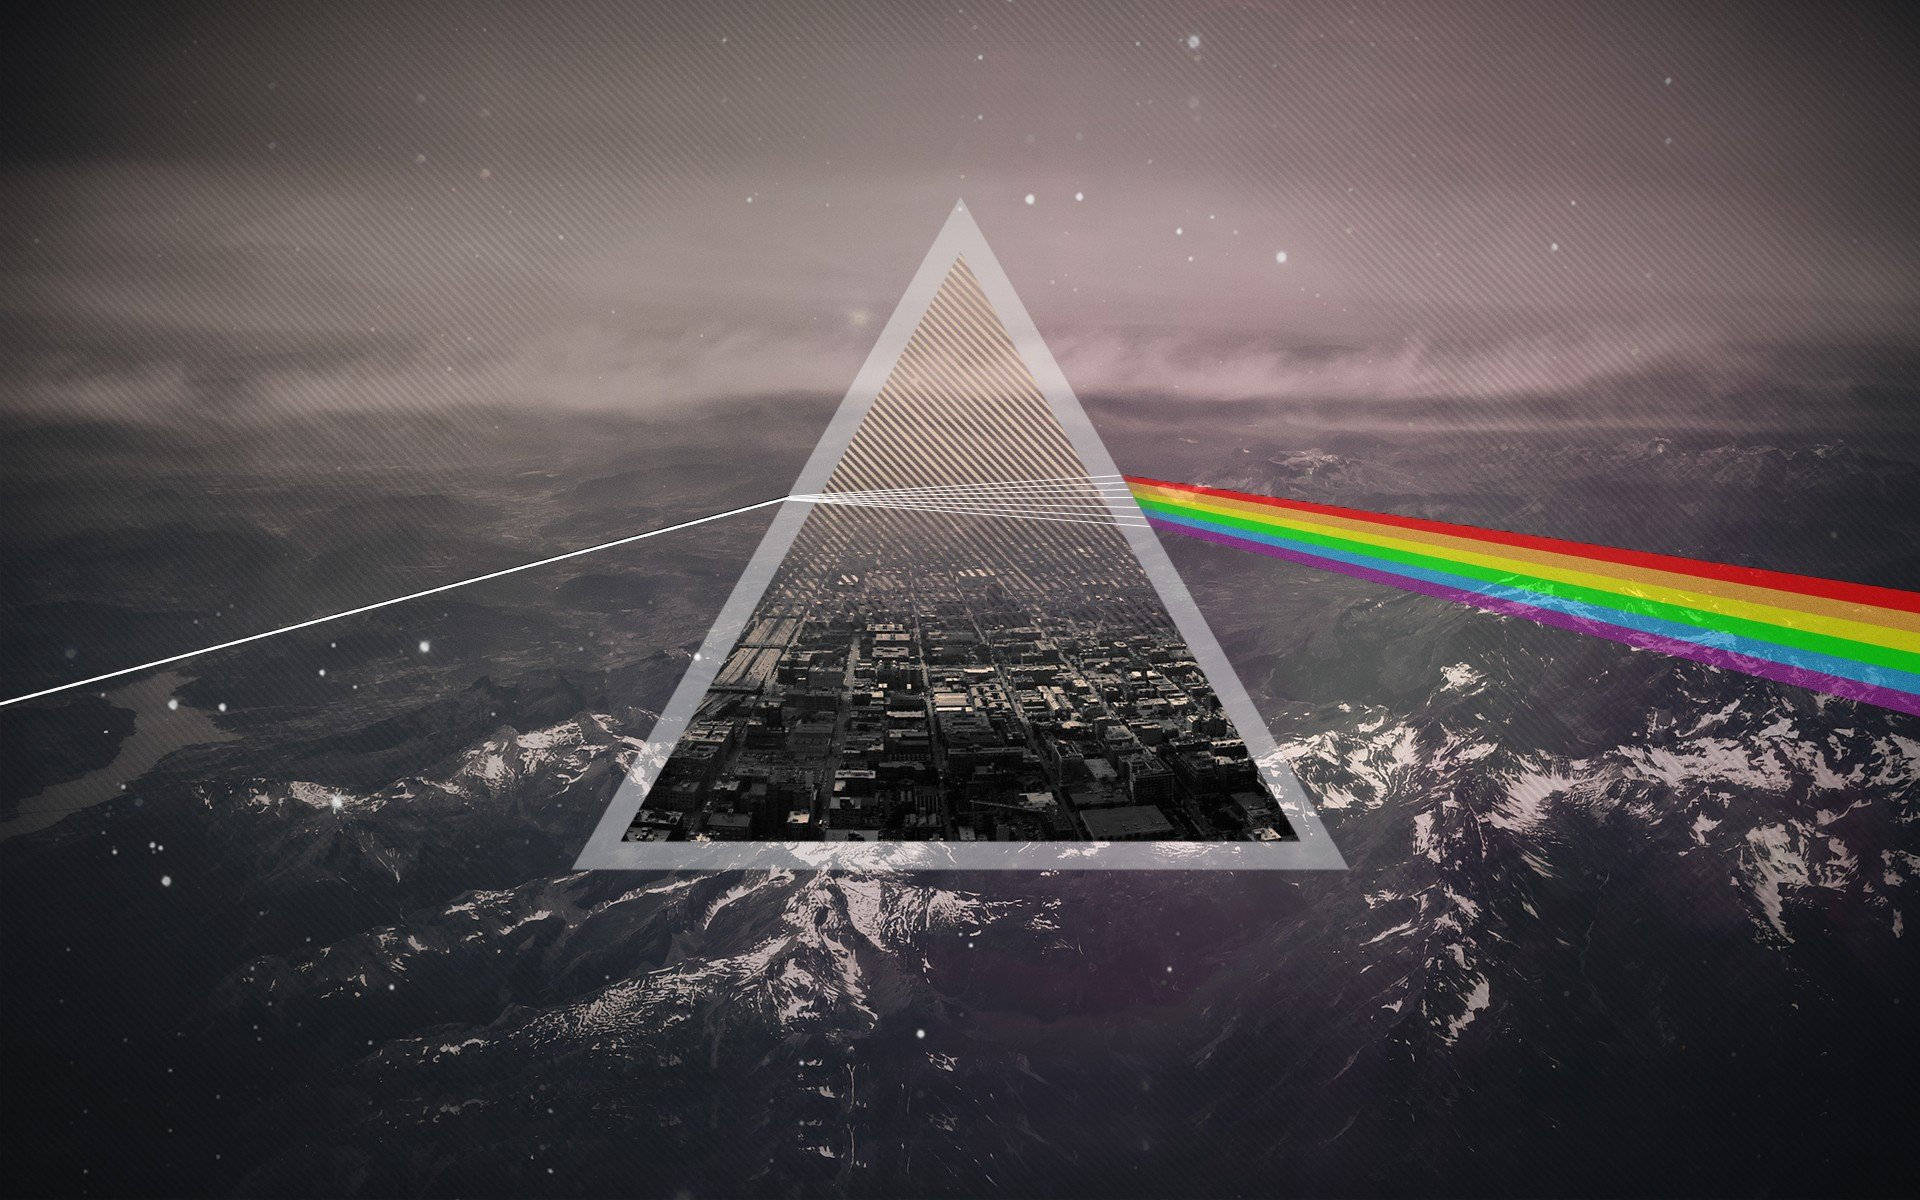 Pink Floyd Dark Side Of The Moon Hd Wallpapers Desktop And